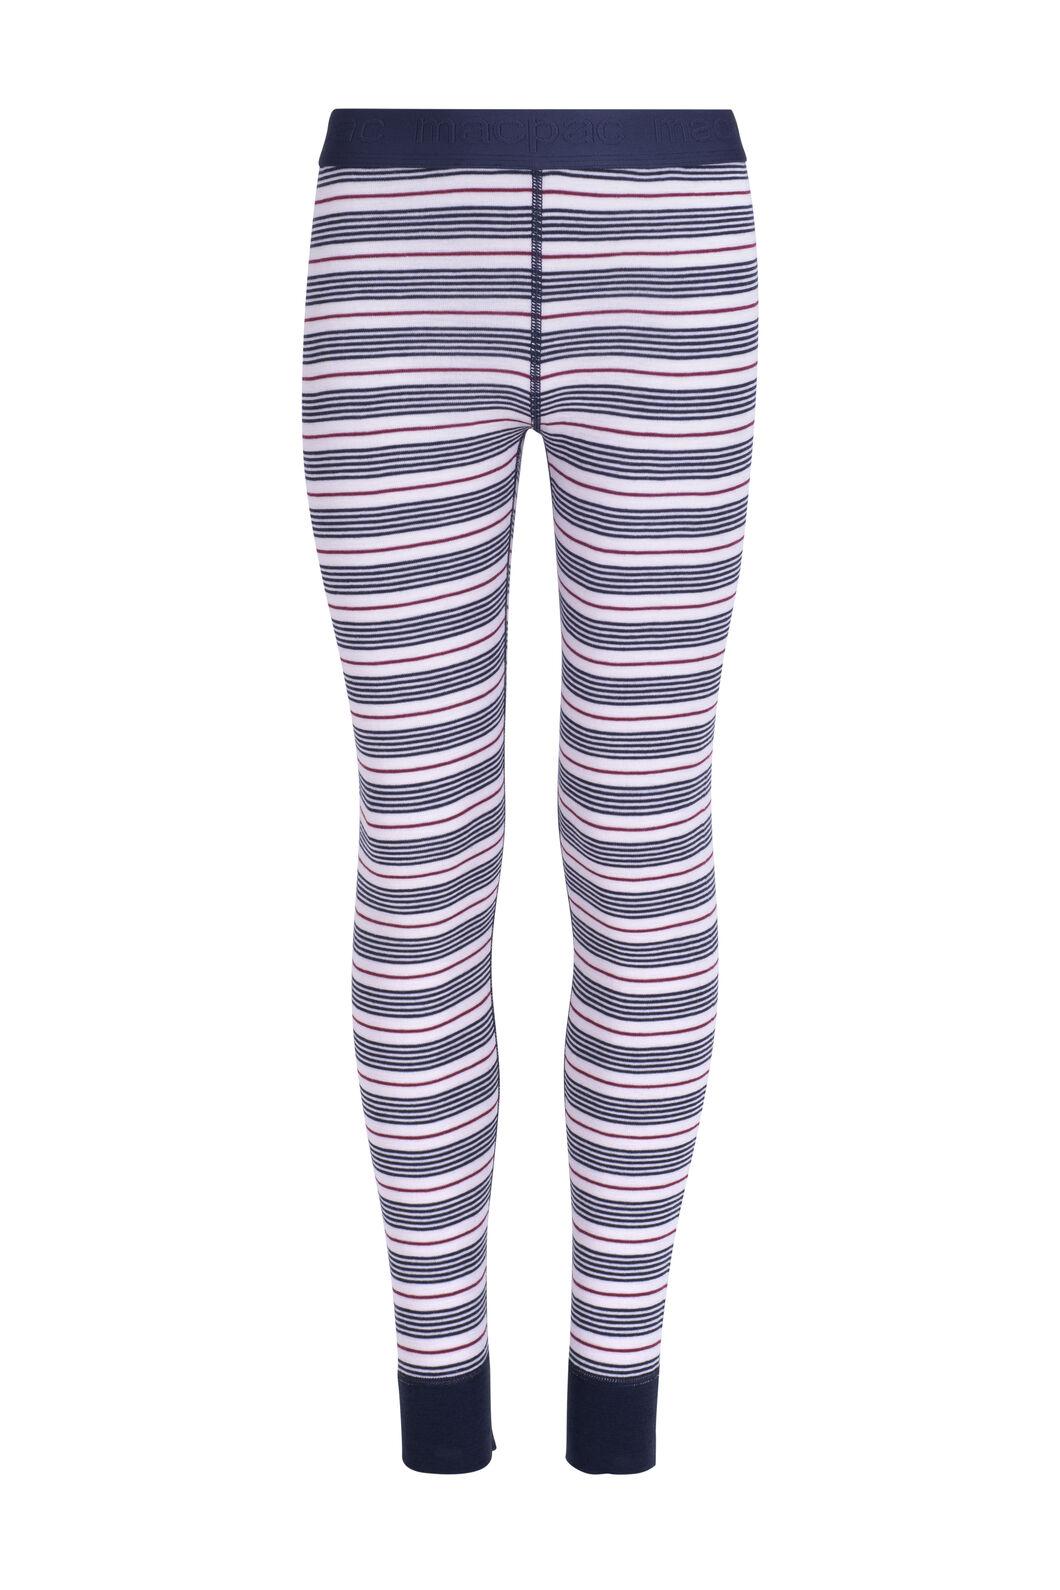 Macpac 220 Merino Long Johns — Kids', Cradle Pink Stripe, hi-res